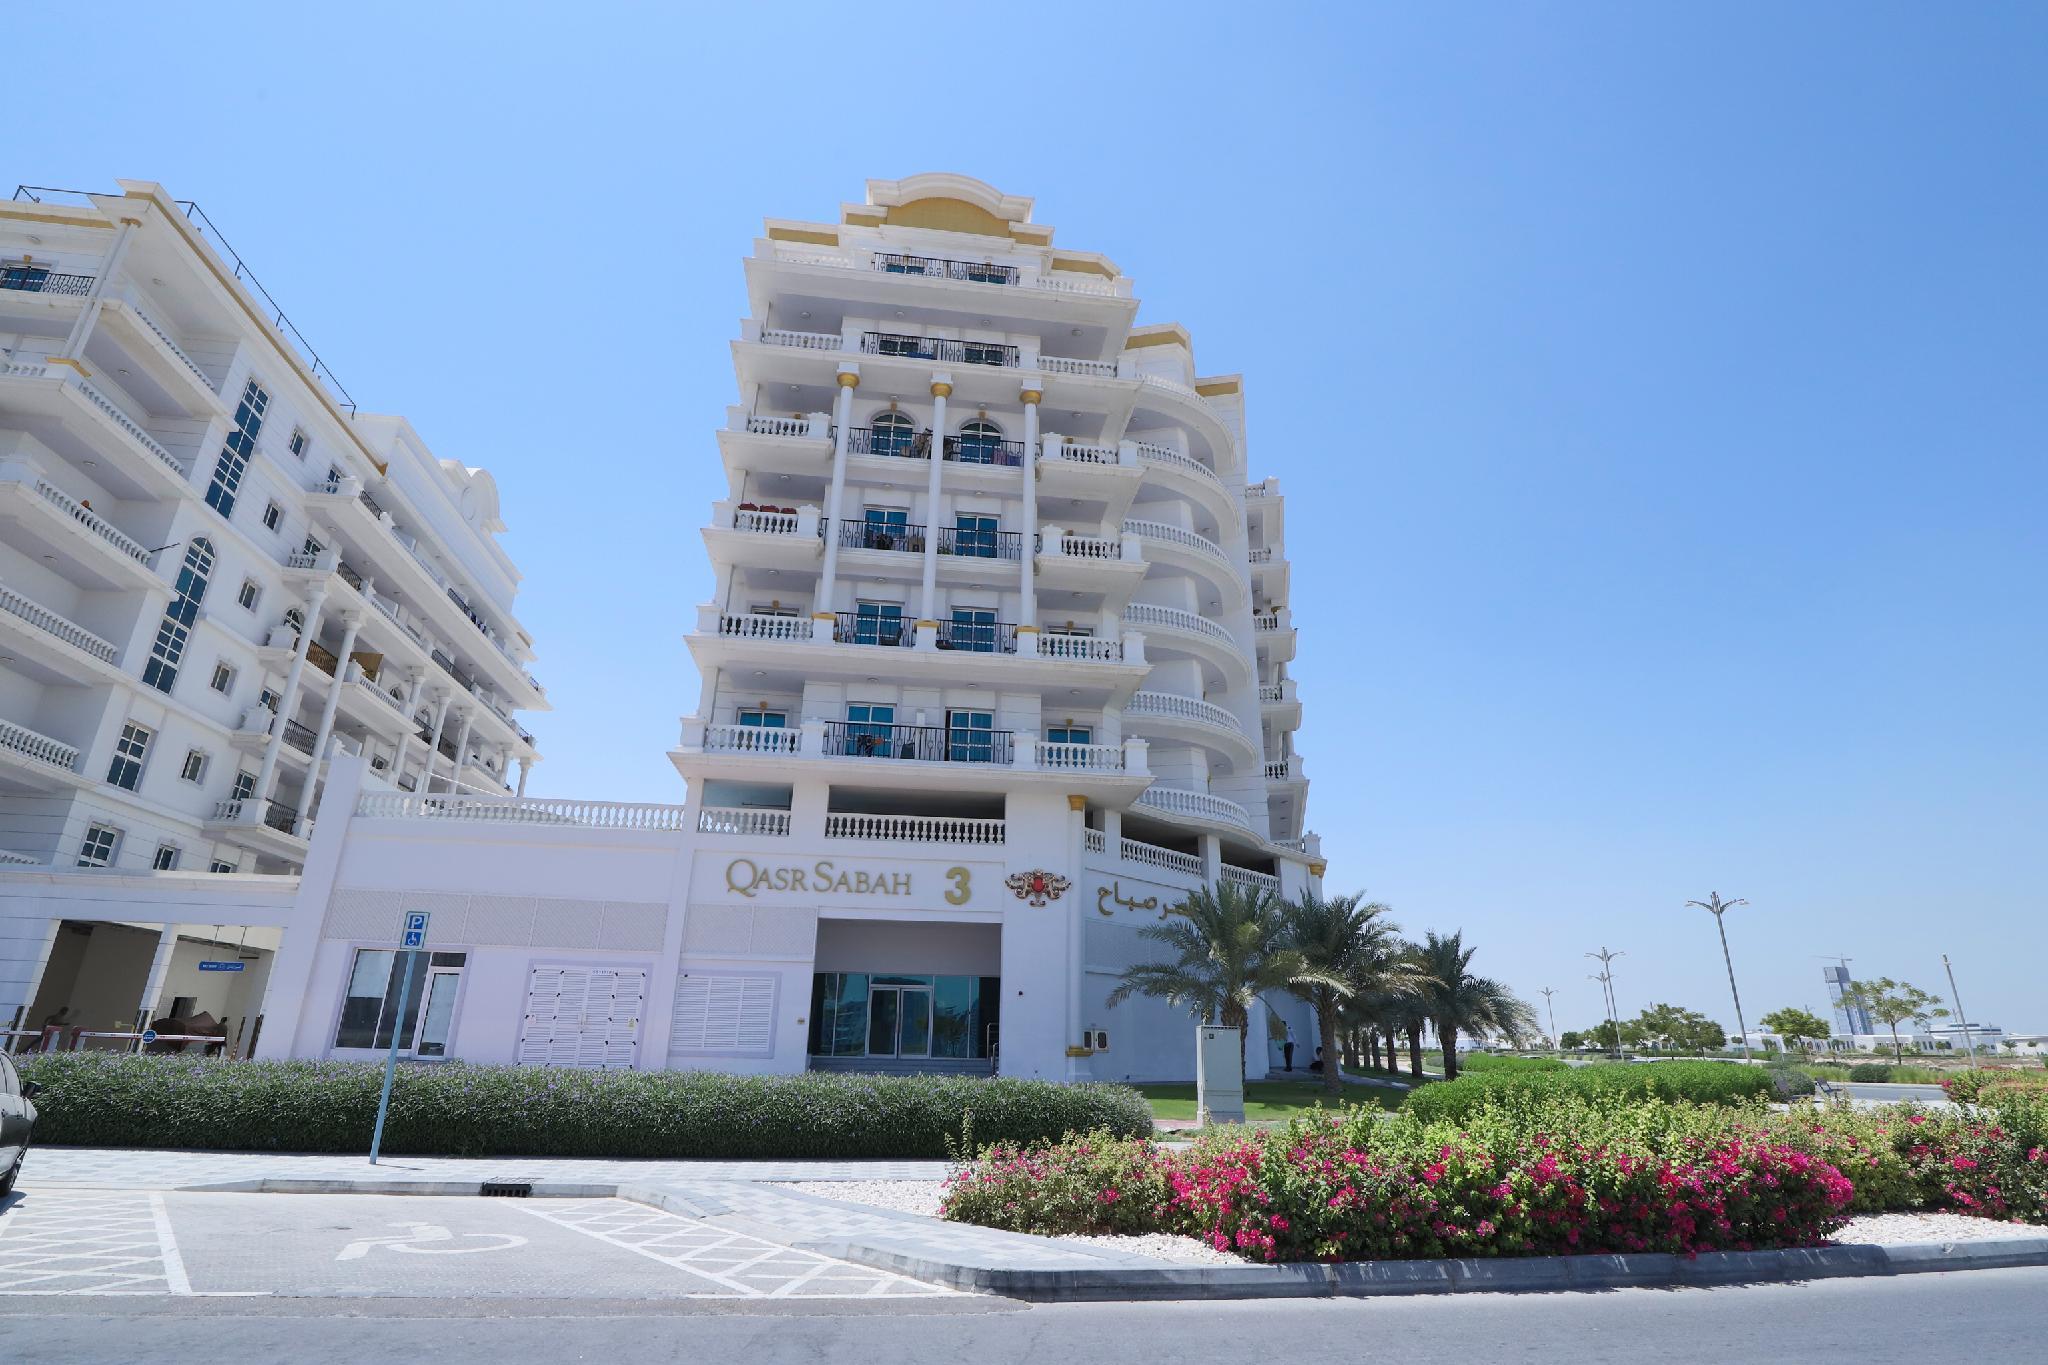 OYO Home 256 1BHK Qasr Sabah 3